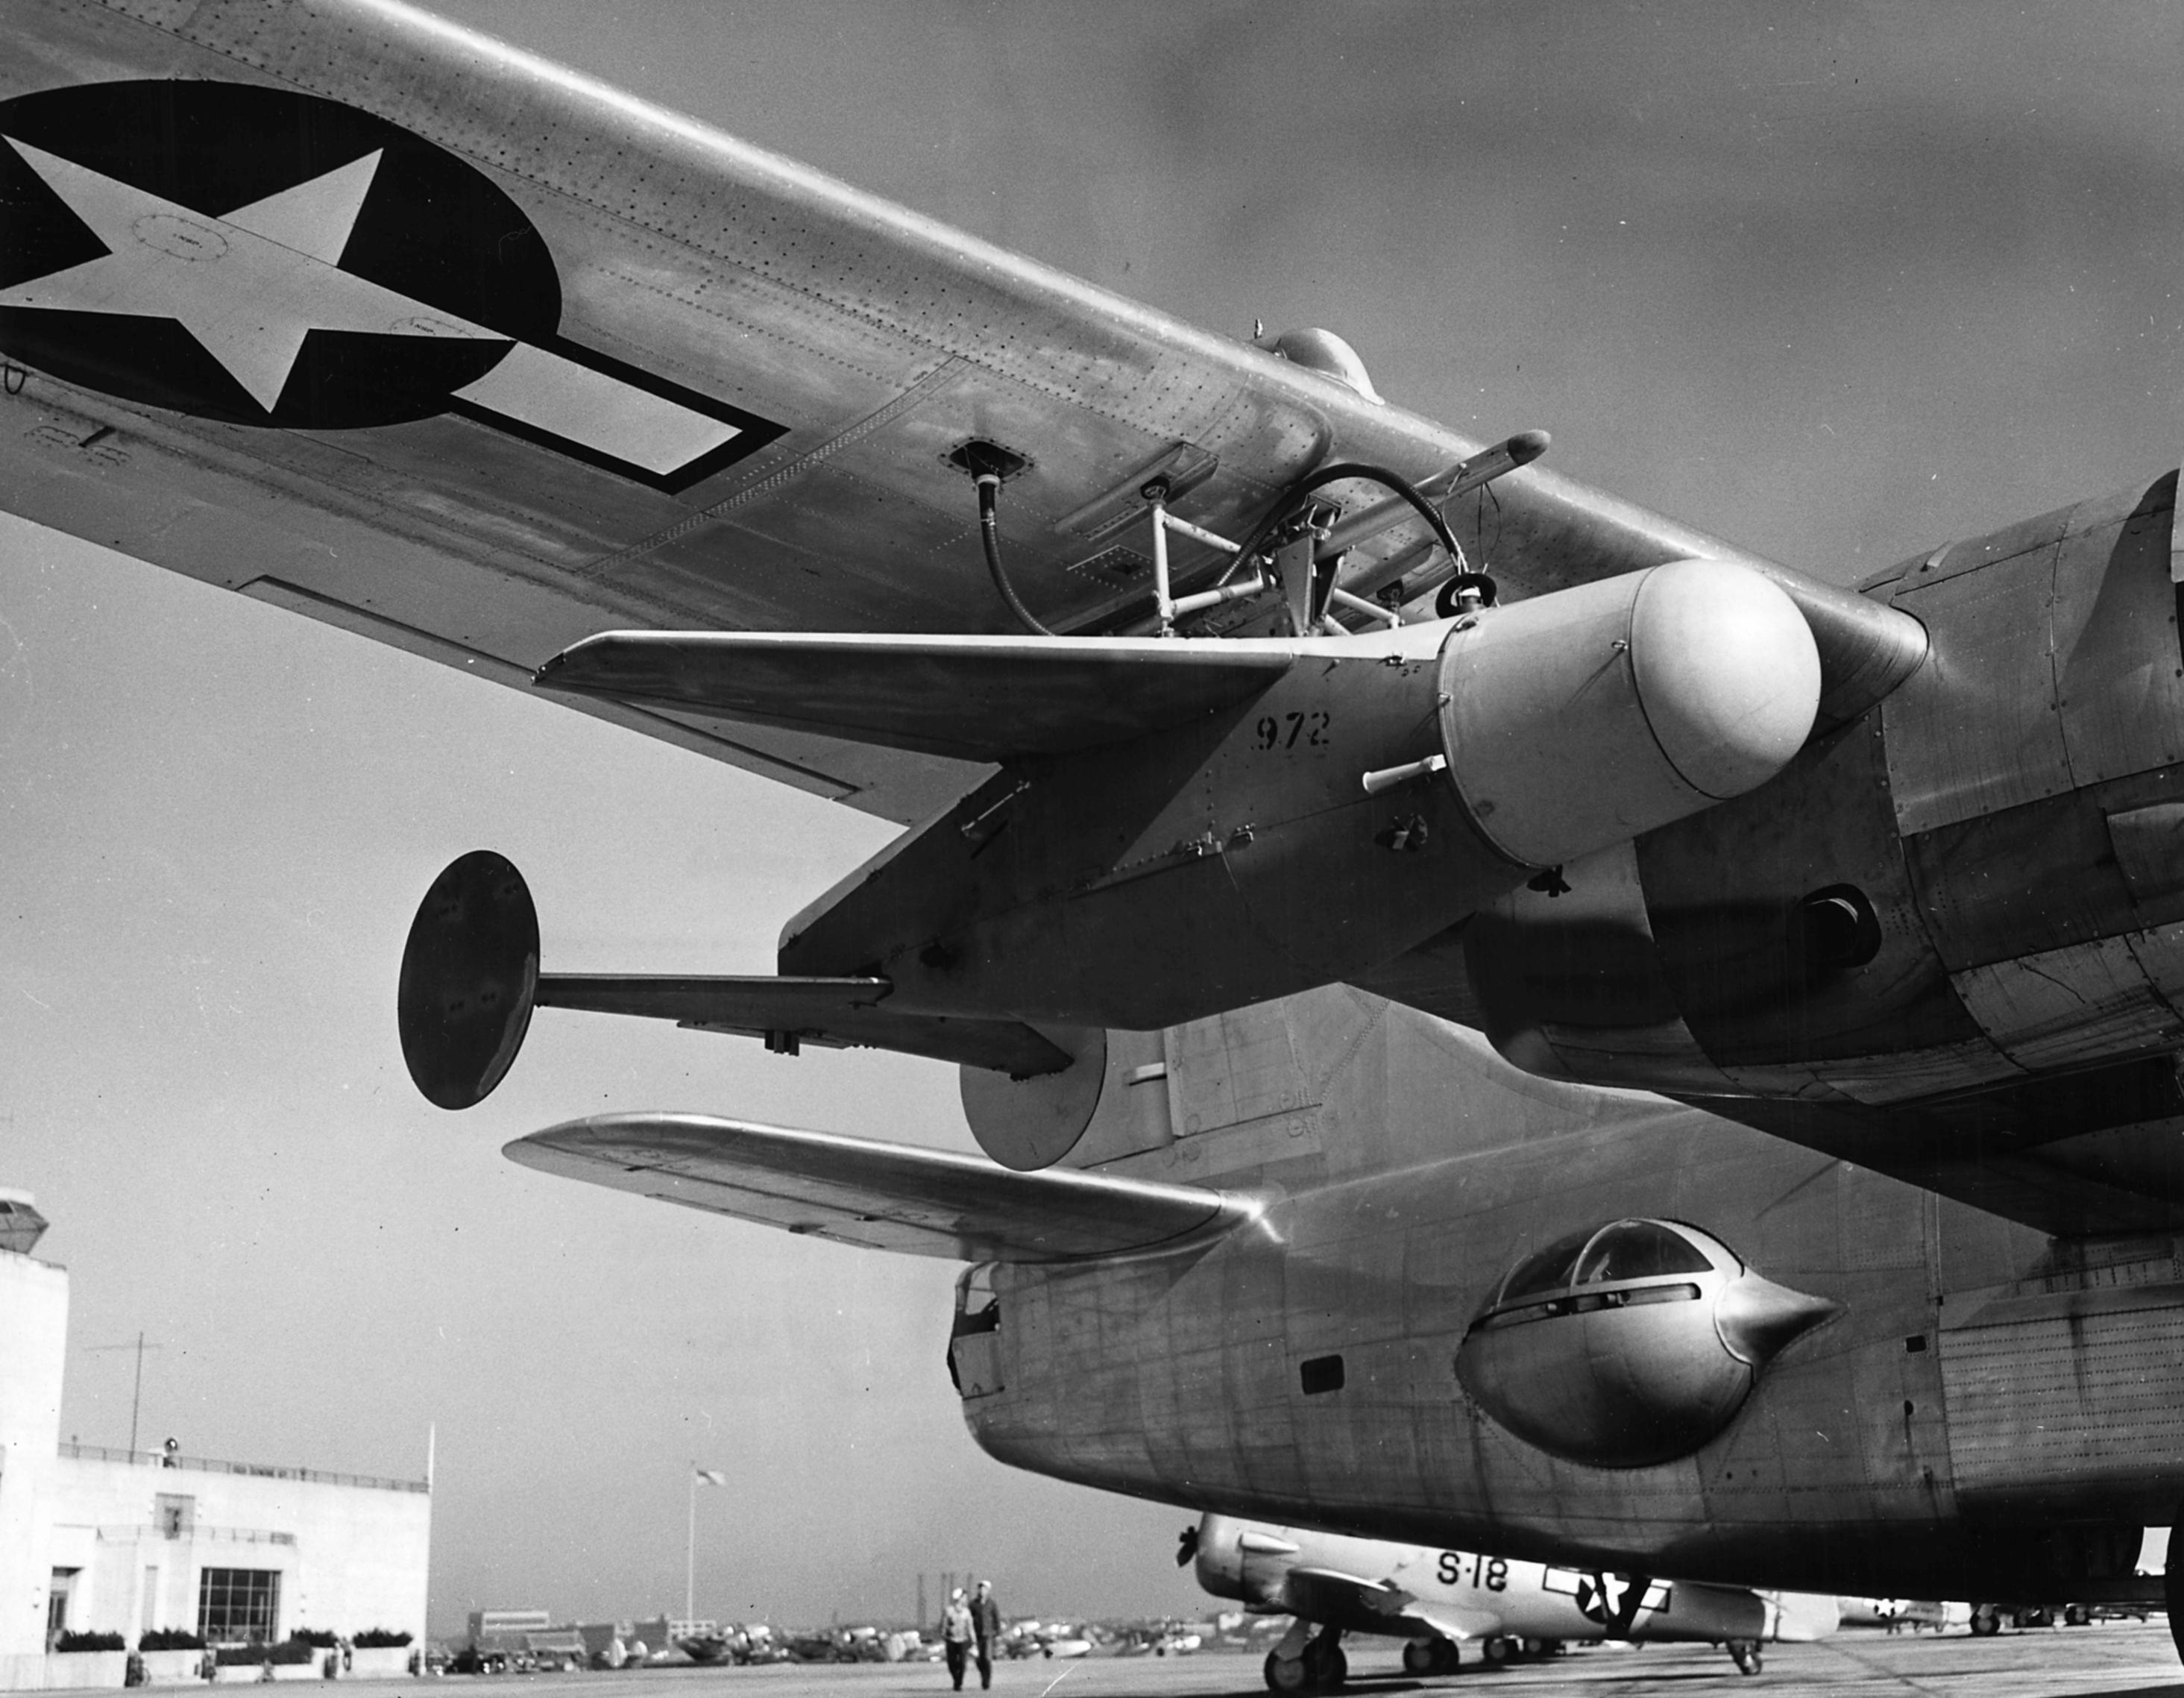 Catalina 15 loads at the gloryhole - 4 9